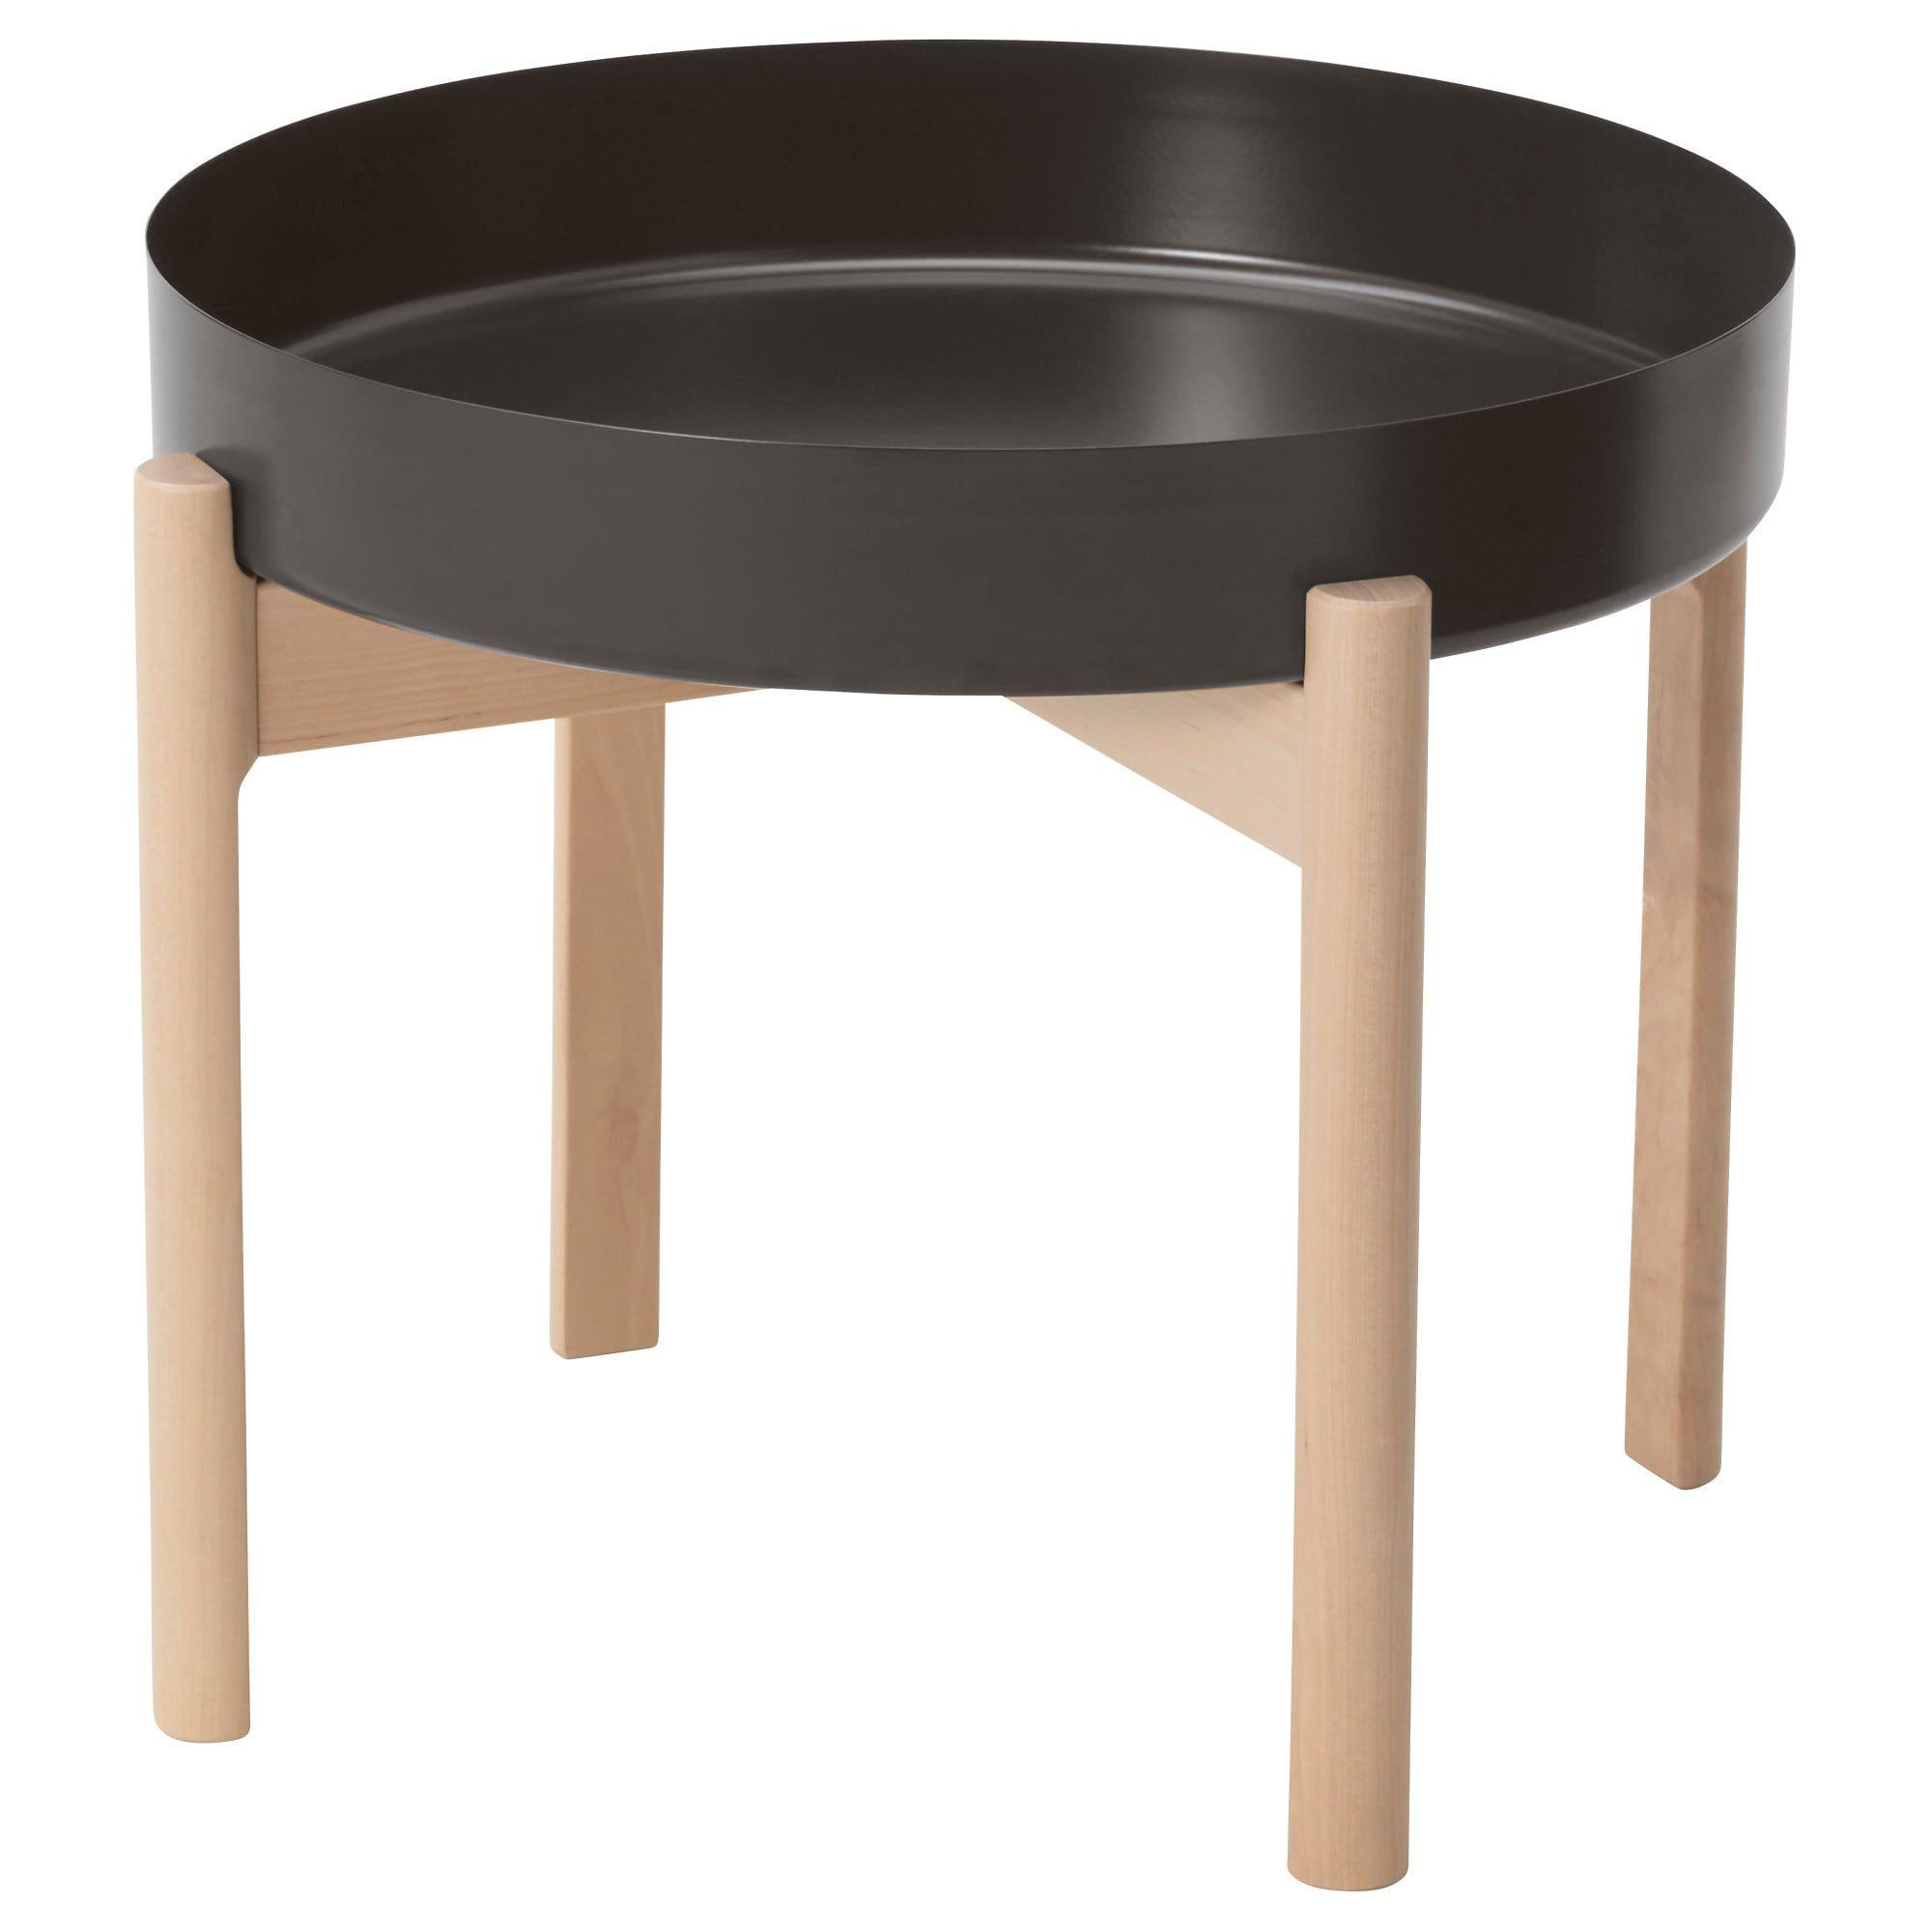 Ikea Ypperlig Dark Gray Birch Coffee Table New Apt In